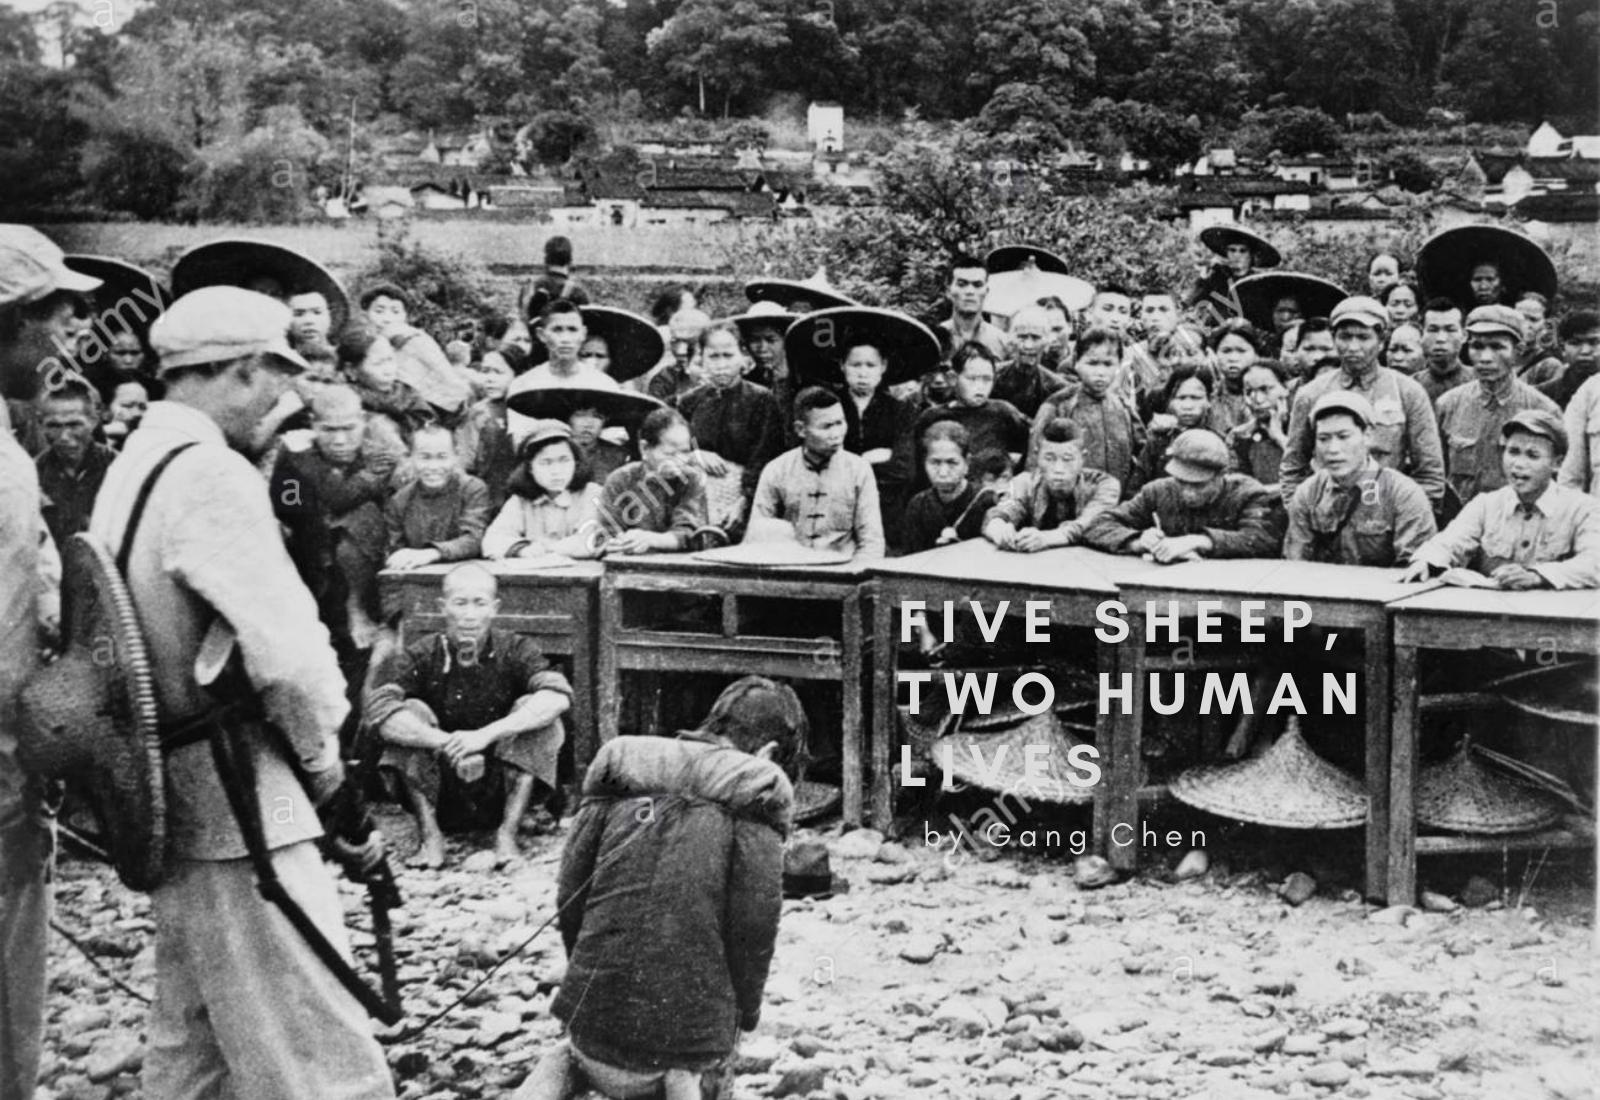 FIVE SHEEP, TWO HUMAN LIVES (China)by Gang Chen